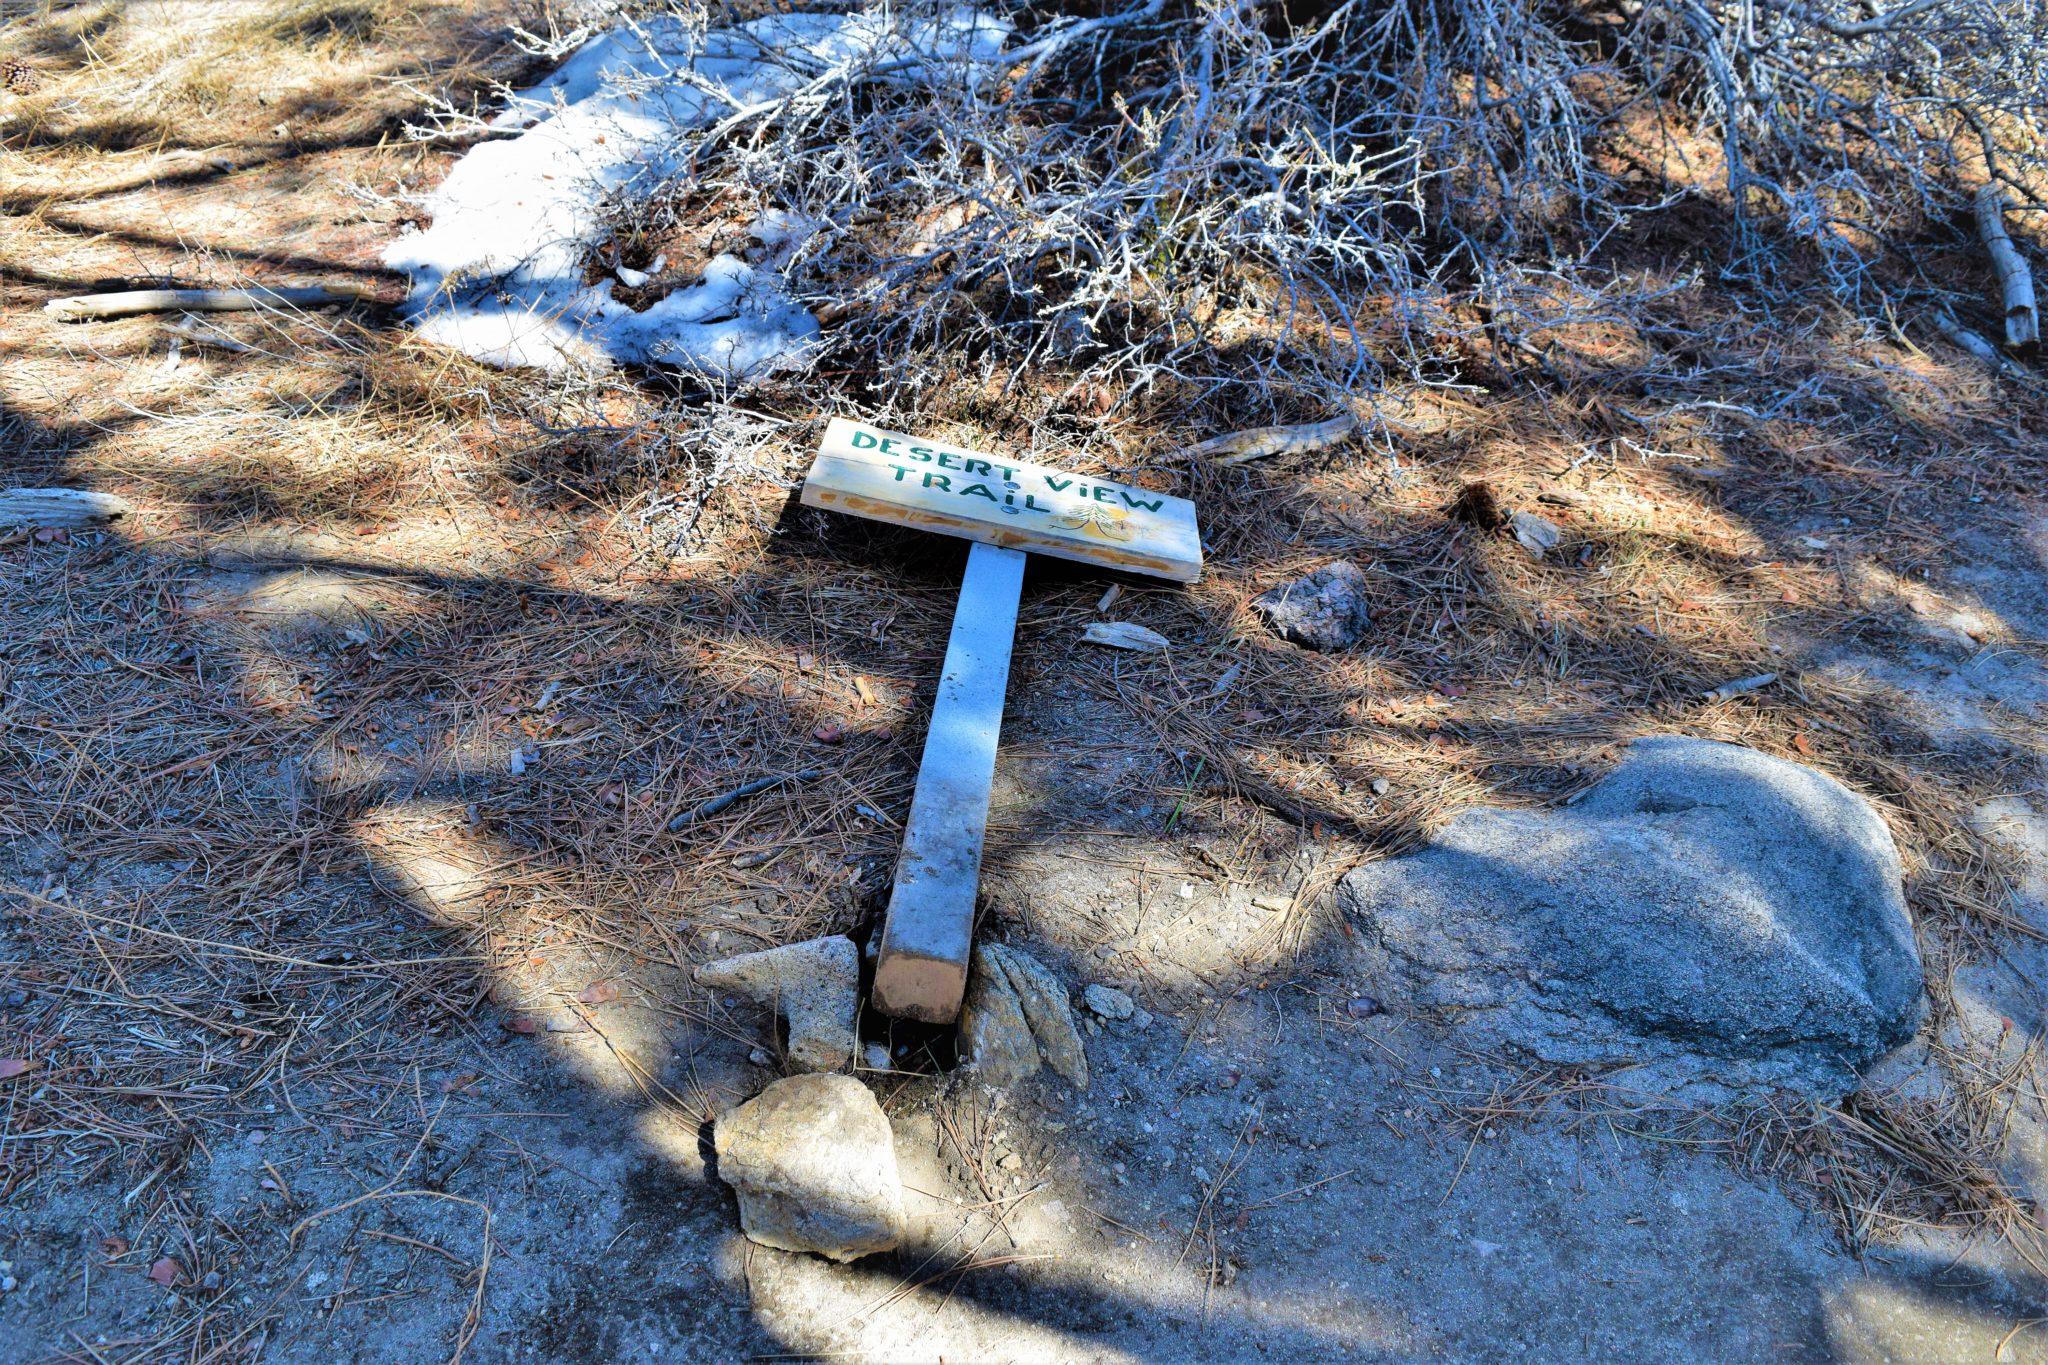 Desert View Trail, San Jacinto State Park, California